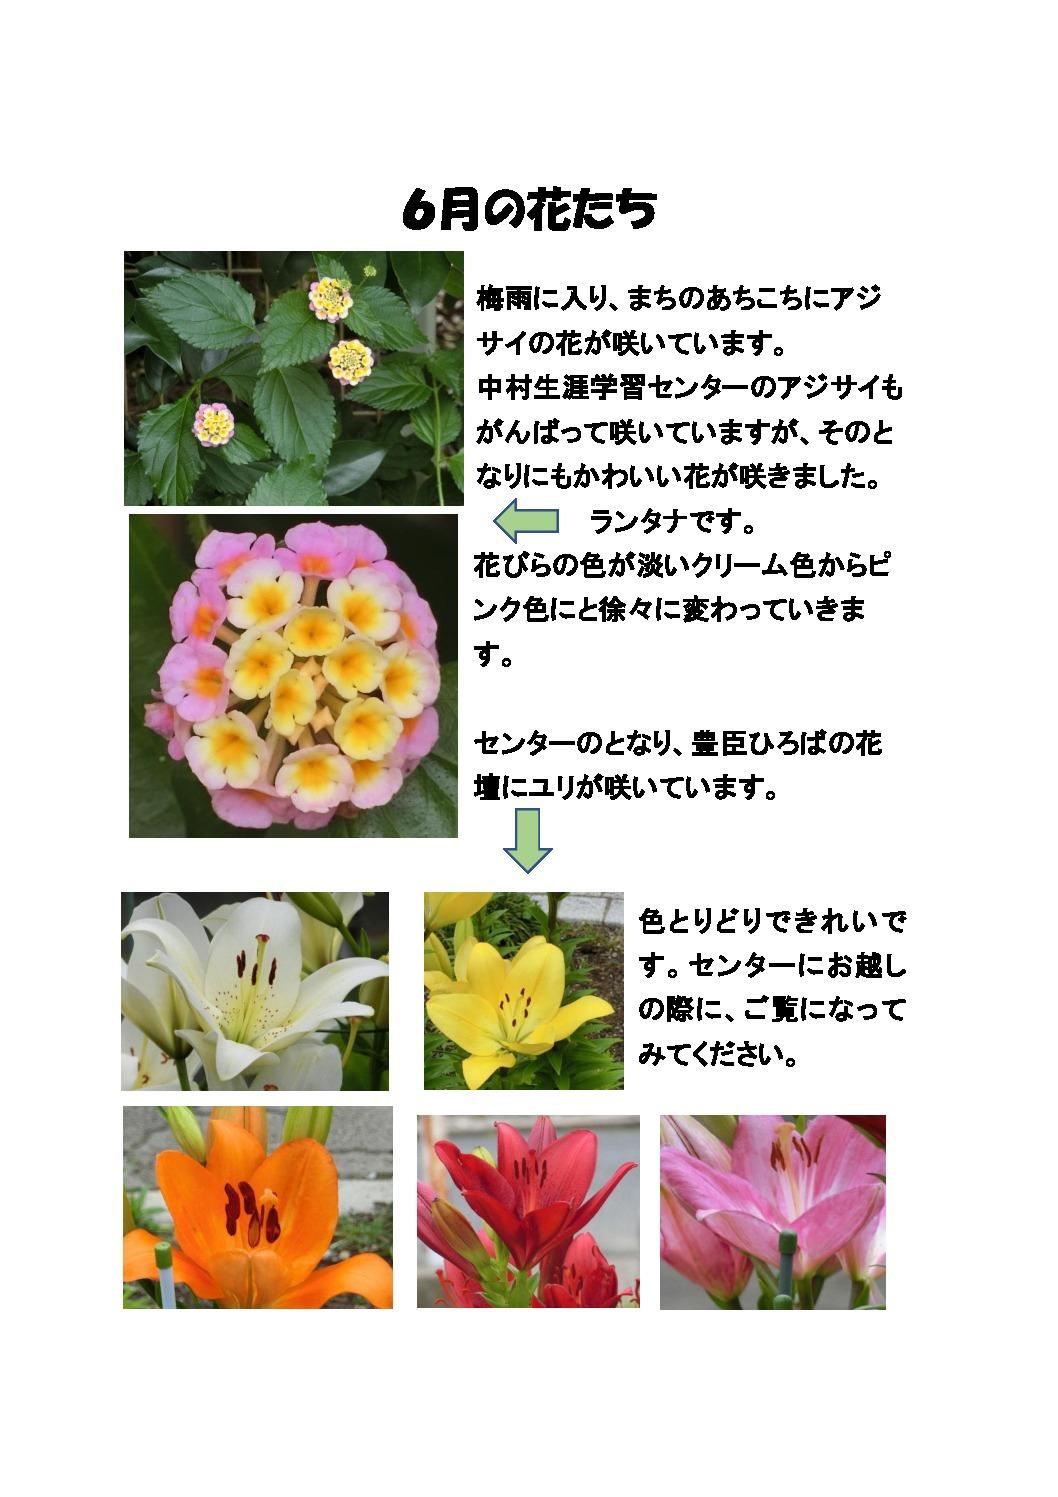 thumbnail of 6月の花たち